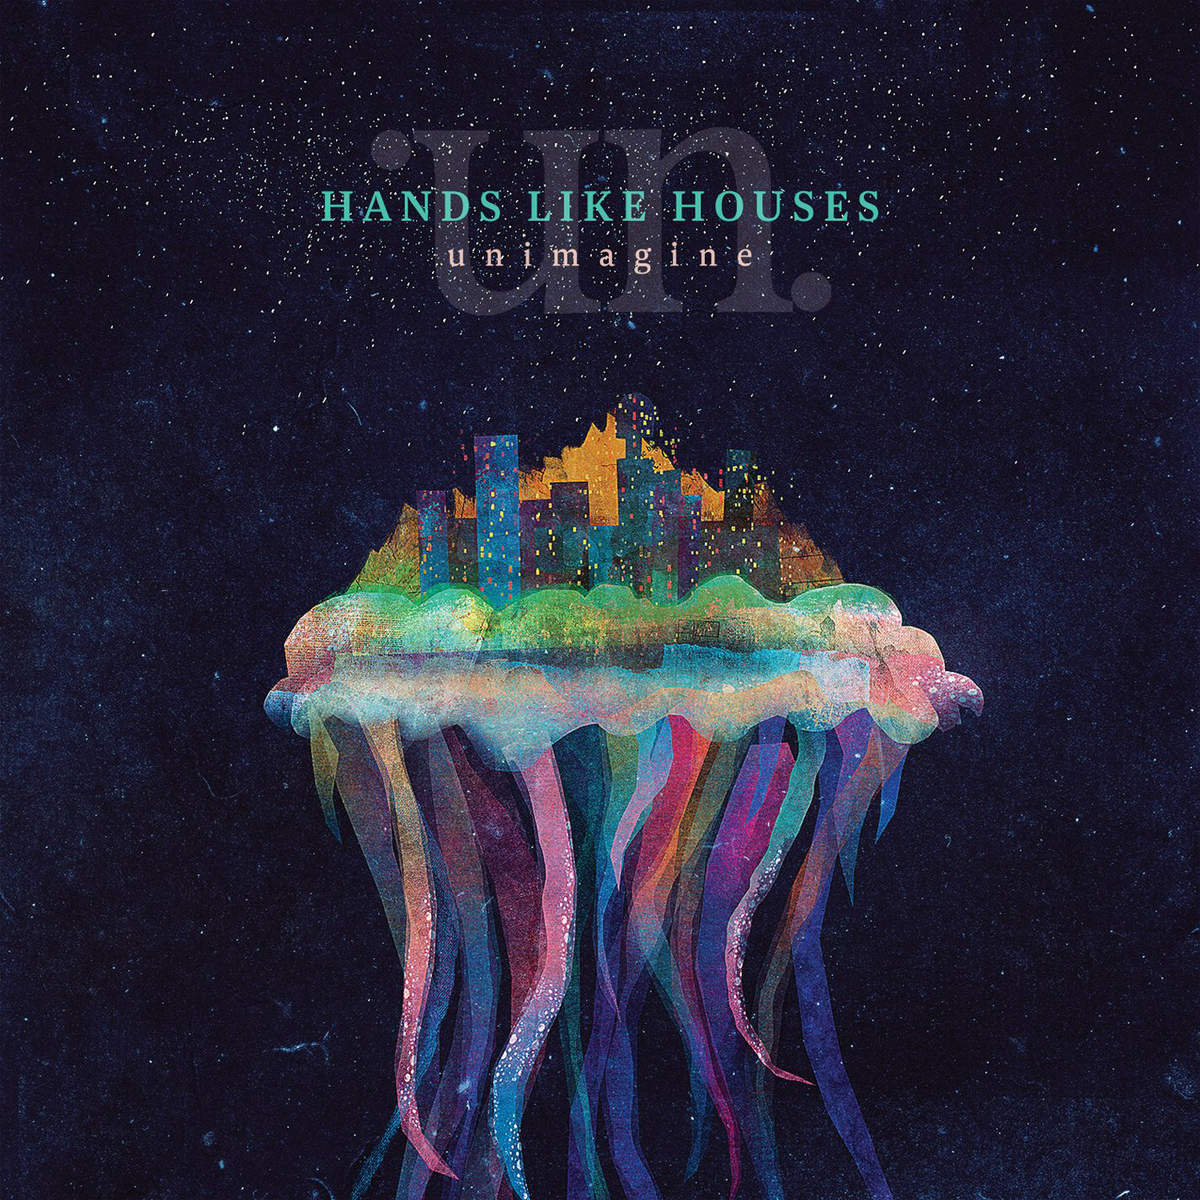 Hands Like Houses - Unimagine (2013)